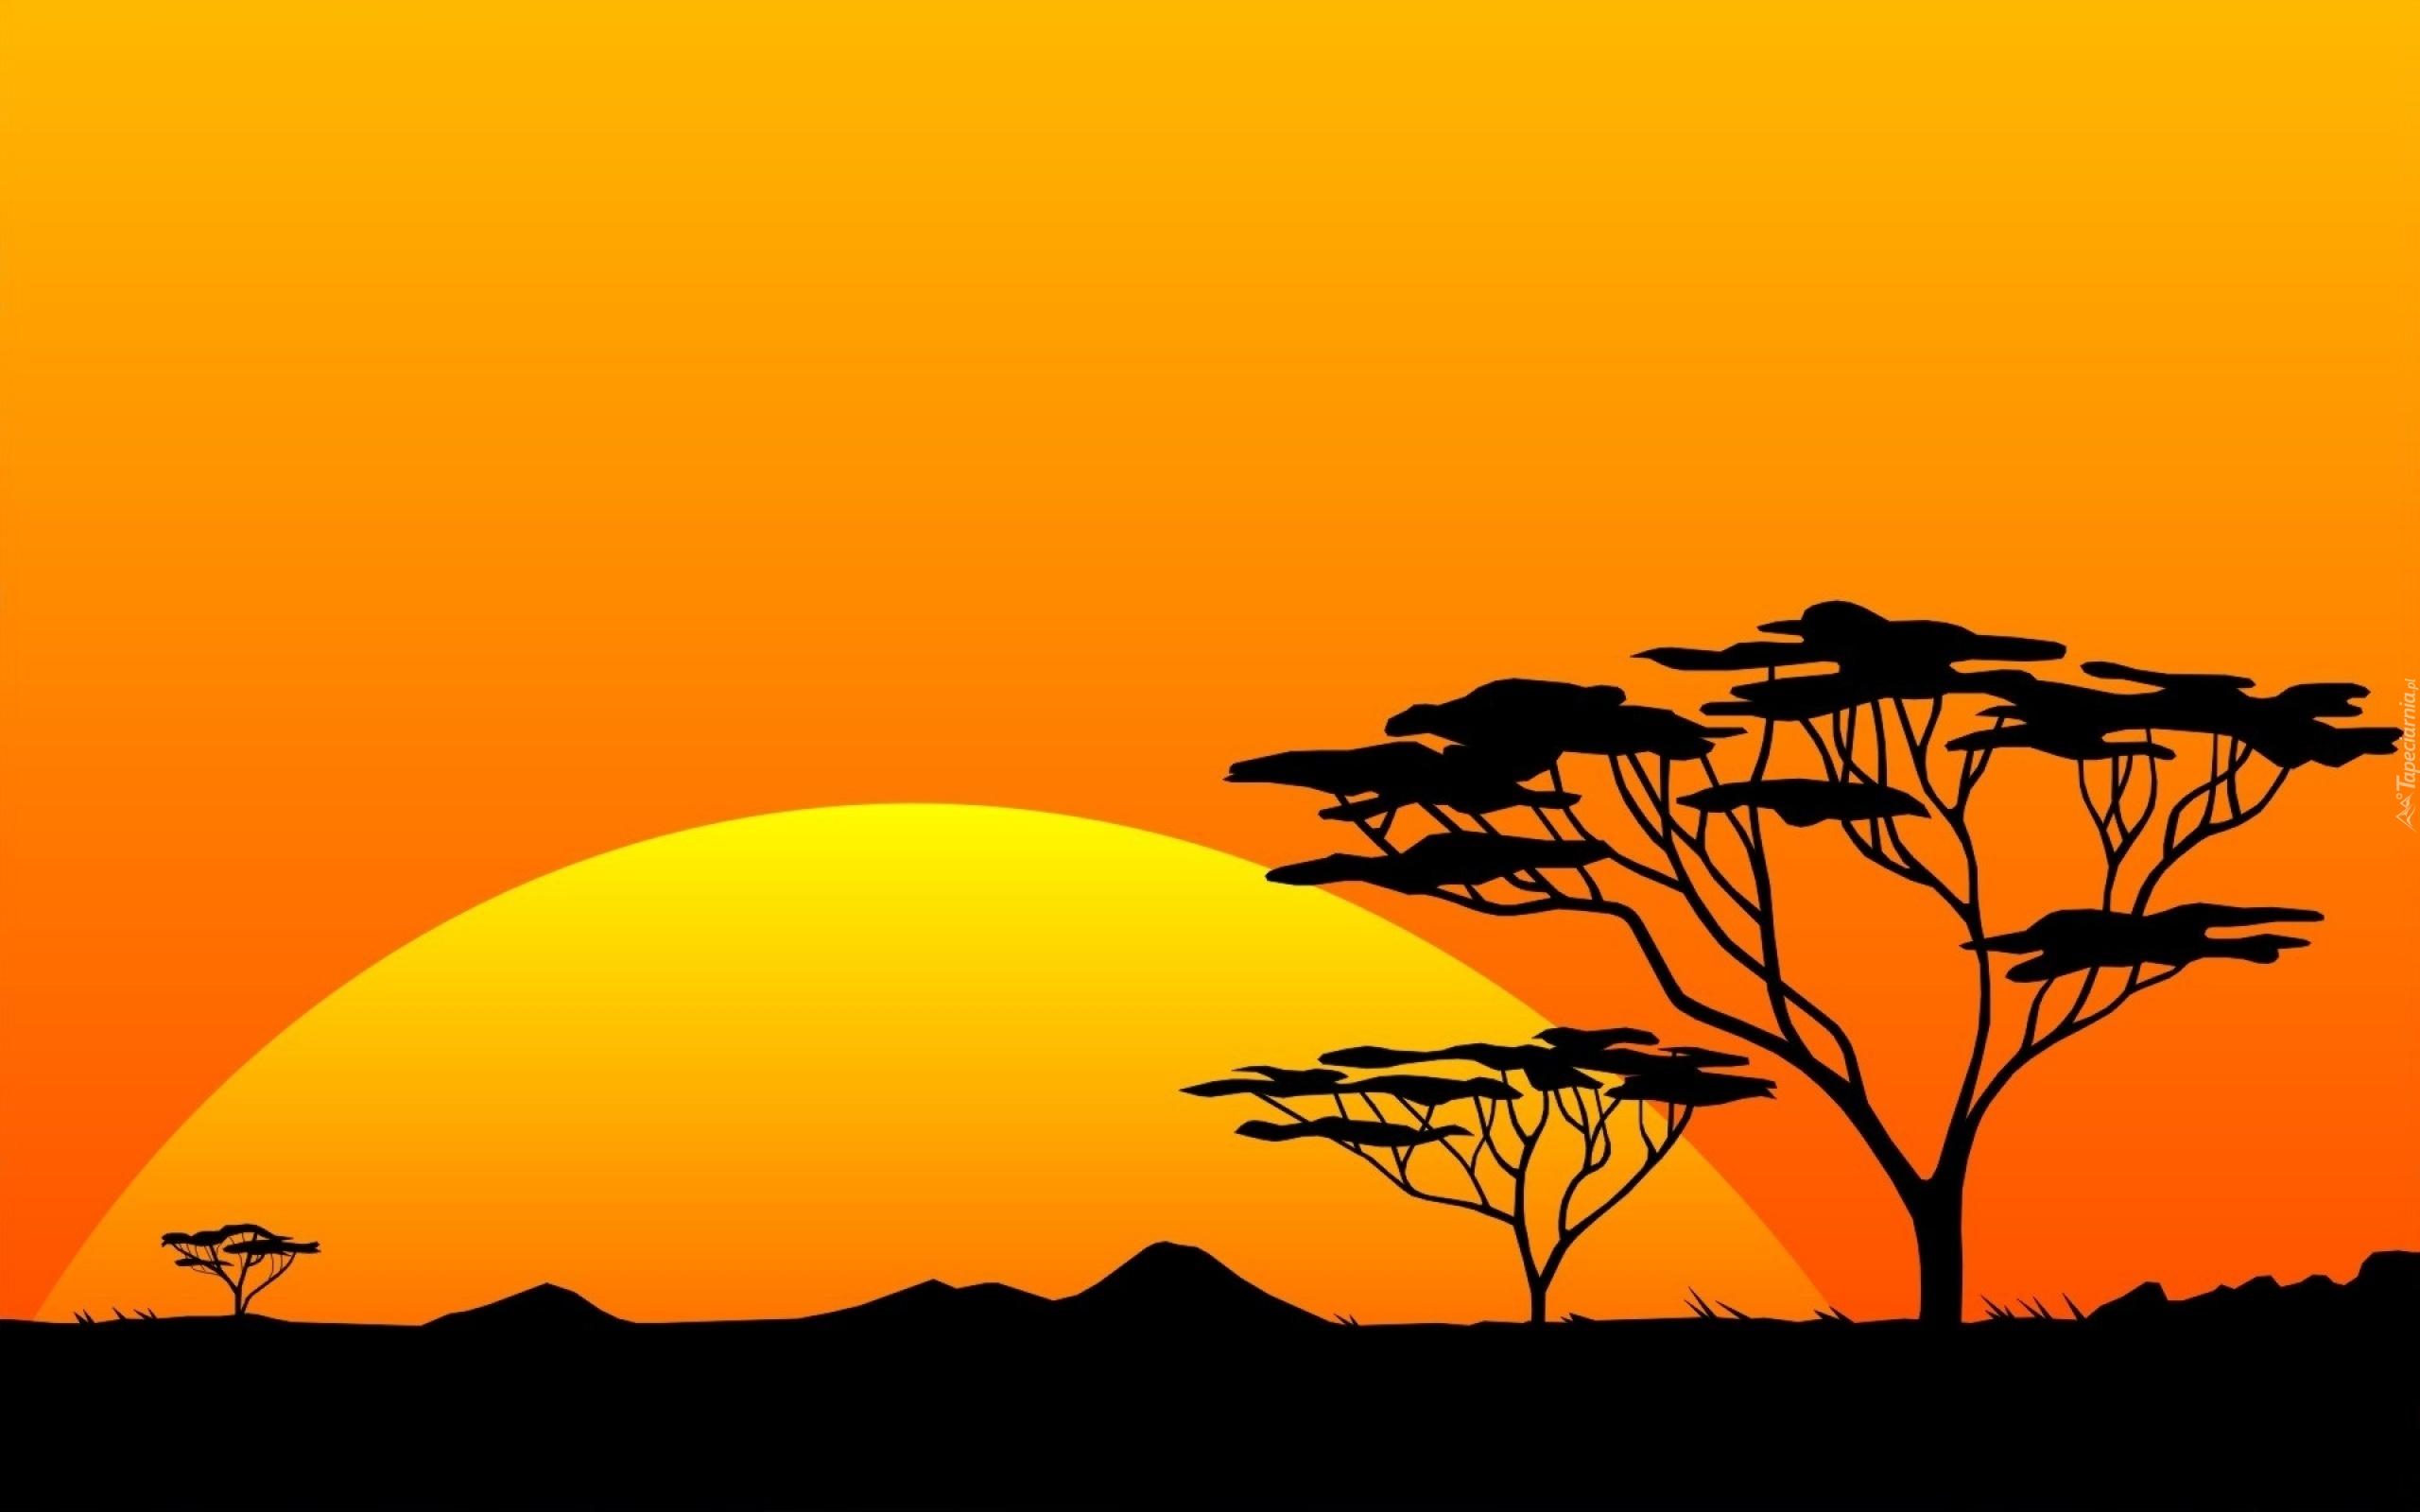 Zach d s o ca afryka - Dessin paysage africain ...